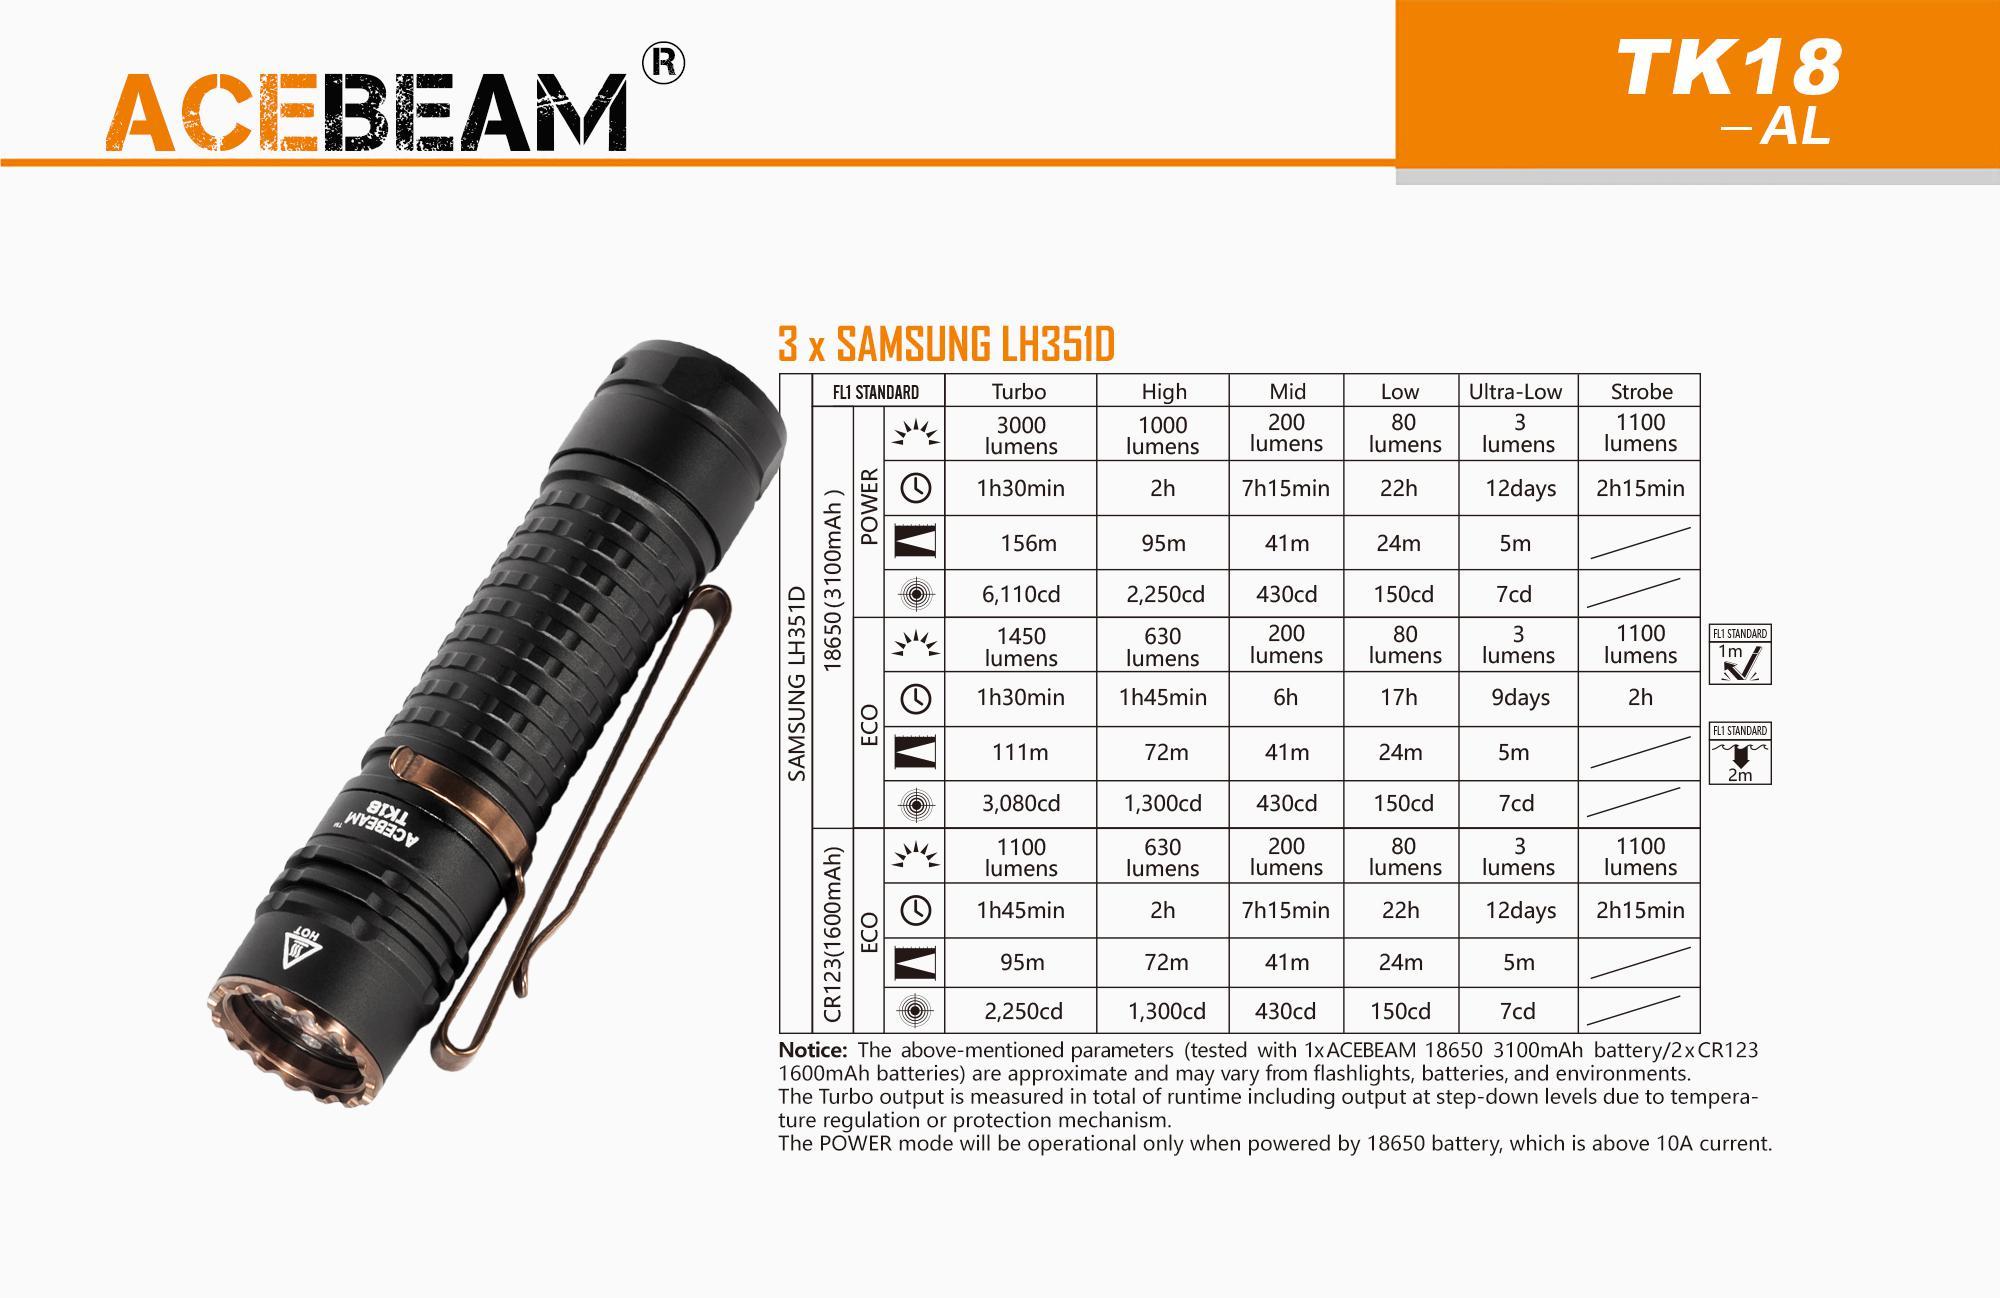 Samsung LED Acebeam TK18 Copper LED Flashlight 3000 Lumen w 3100mAh Battery /&